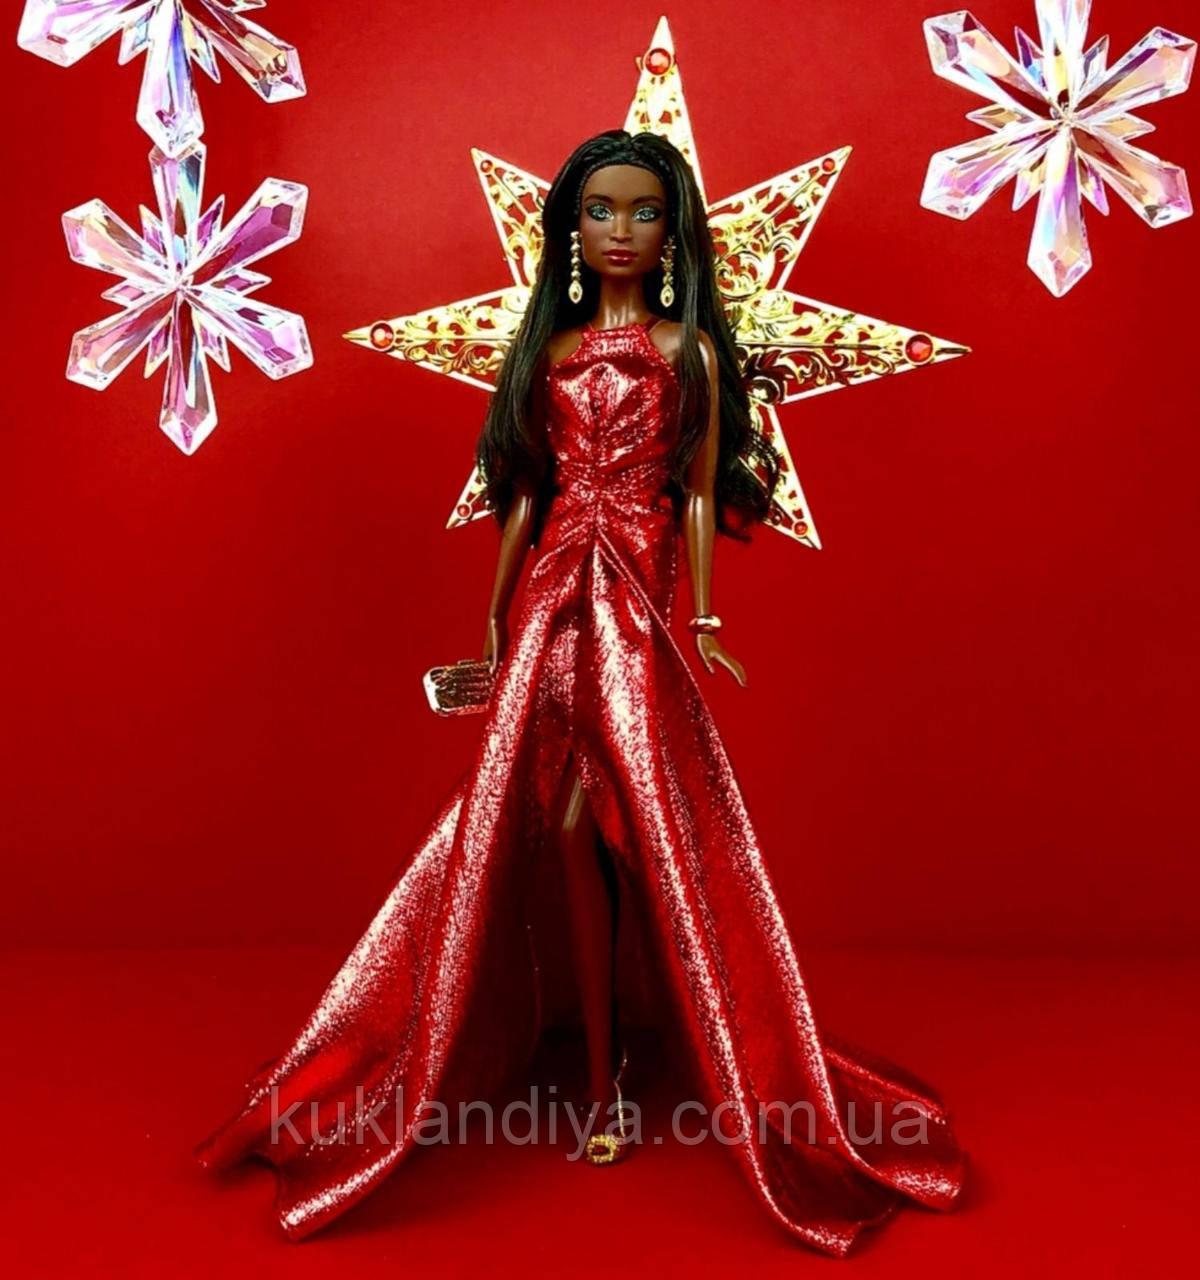 Колекційна лялька Барбі Ніккі Святкова - 2017 Holiday Barbie Nikki